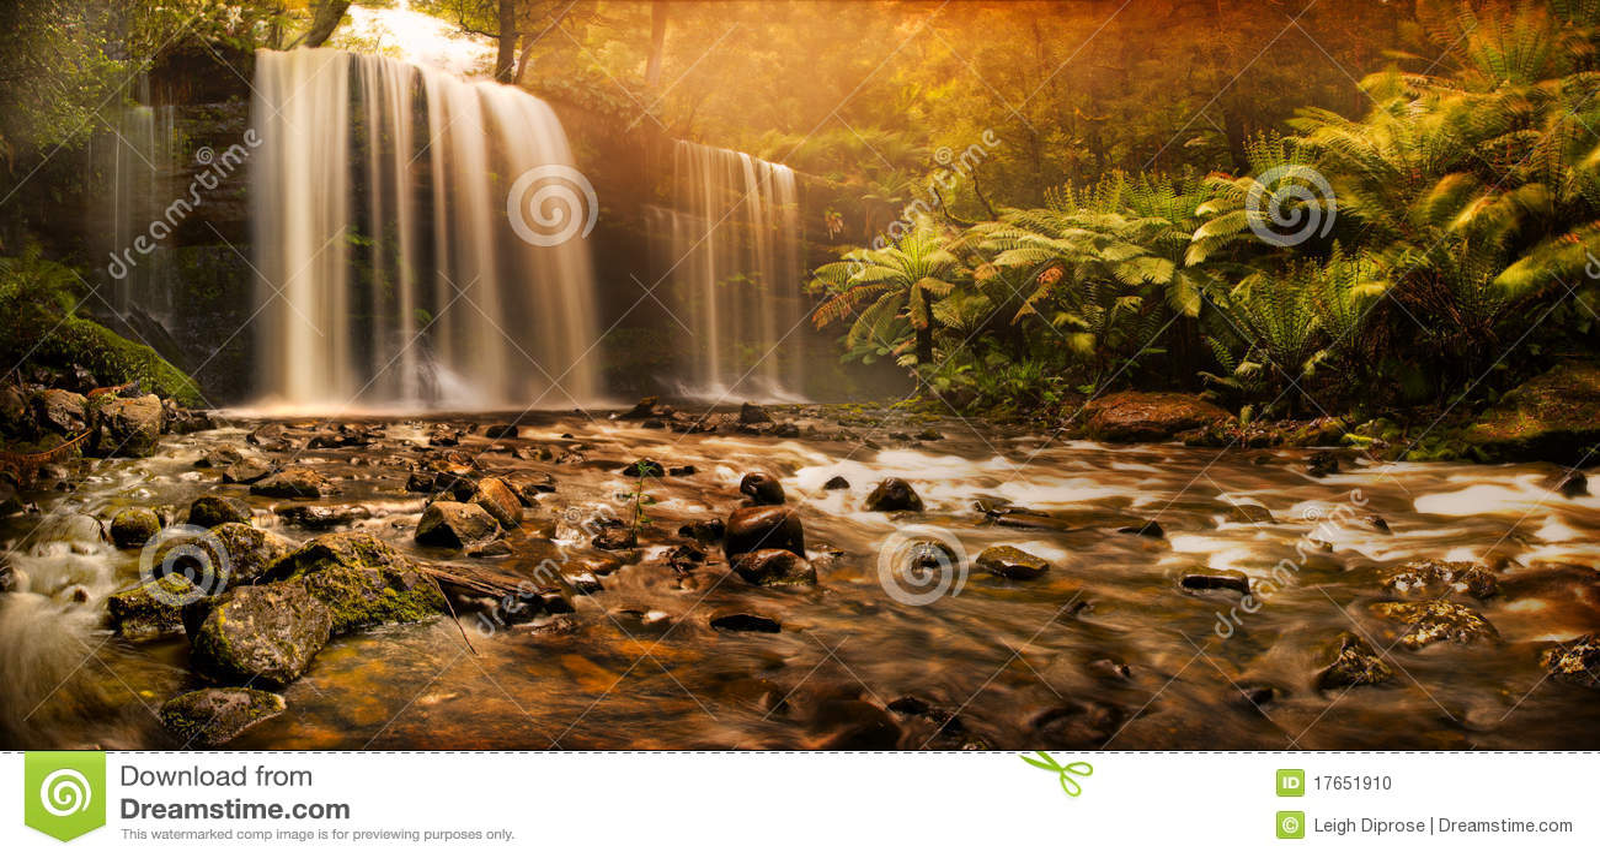 Russell Falls waterfall